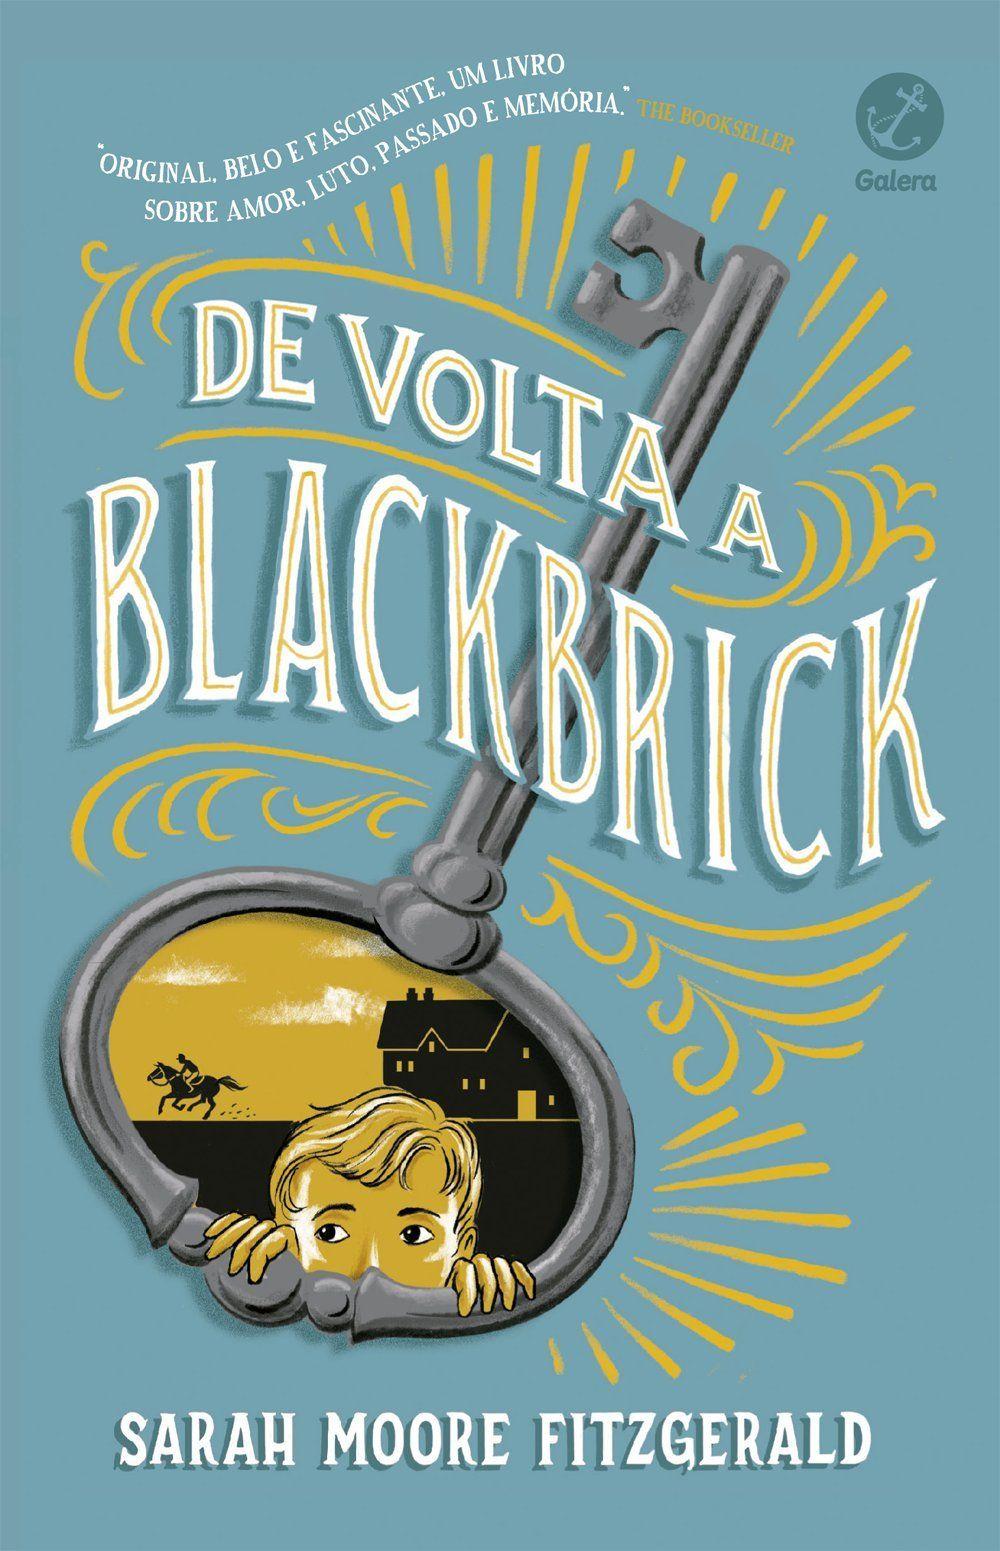 DE VOLTA A BLACKBRICK